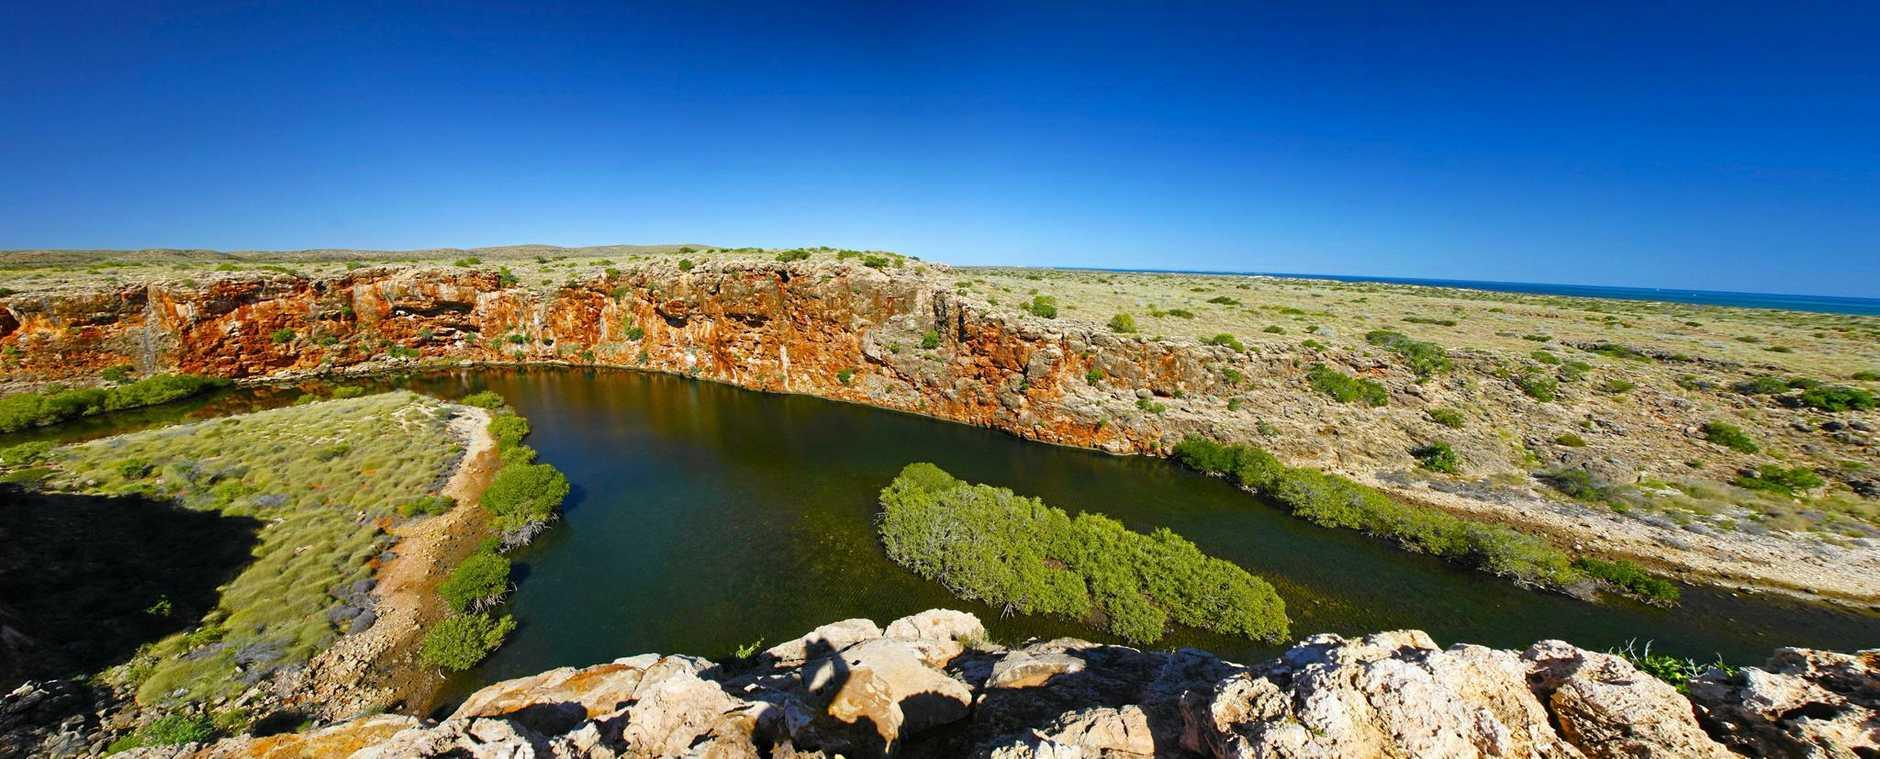 Cape Range National Park. Mandatory credit: Australia's Coral Coast